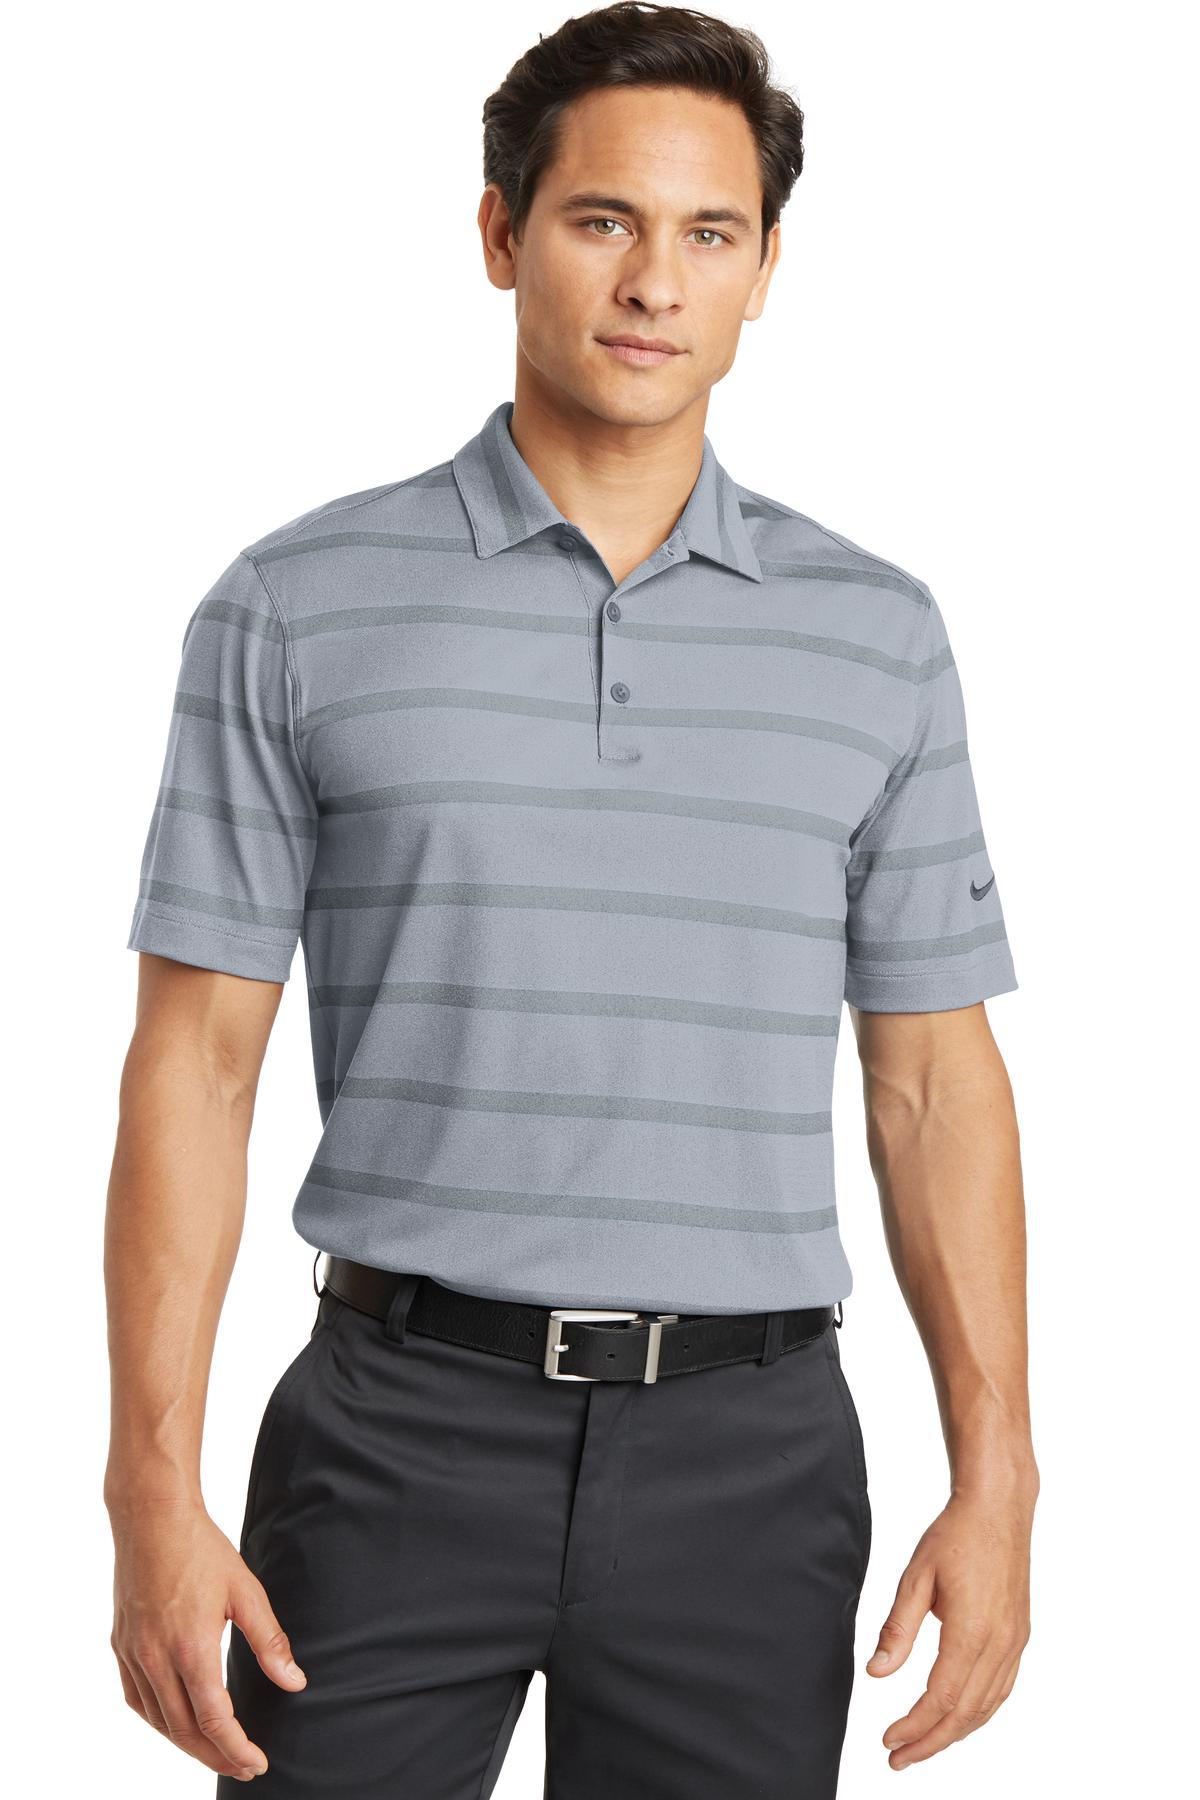 Nike Golf 677786 - Dri-FIT Fade Stripe Polo